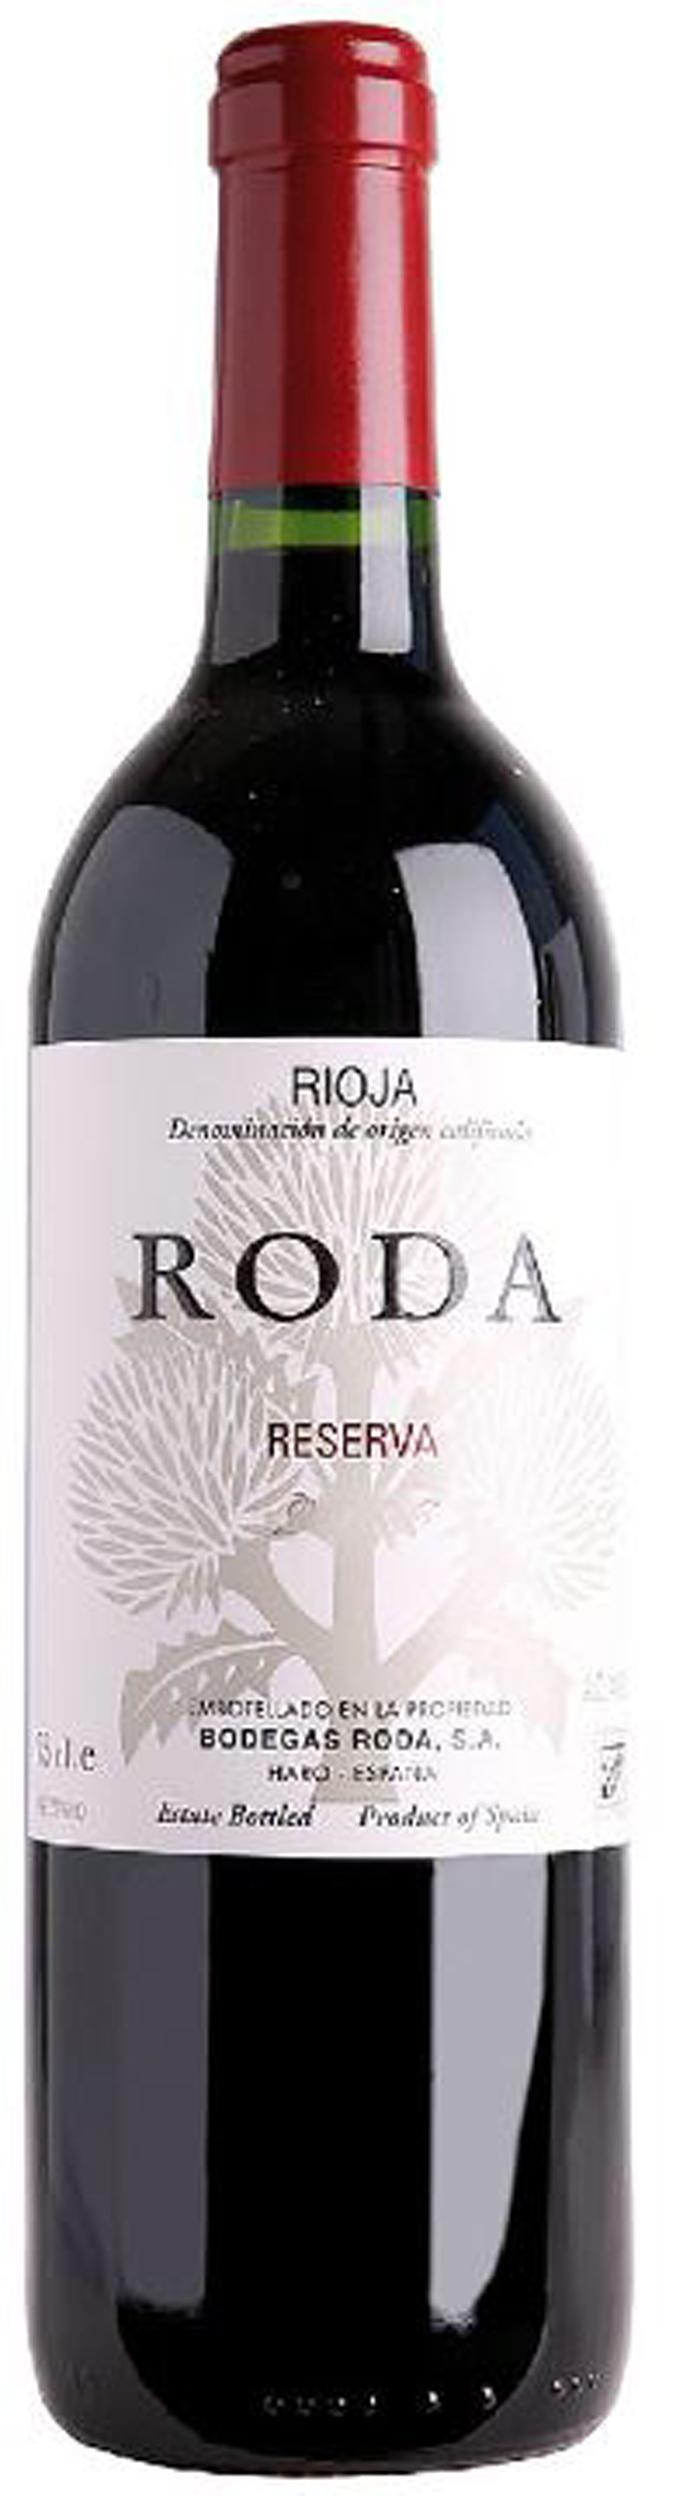 Roda Reserva 2013.